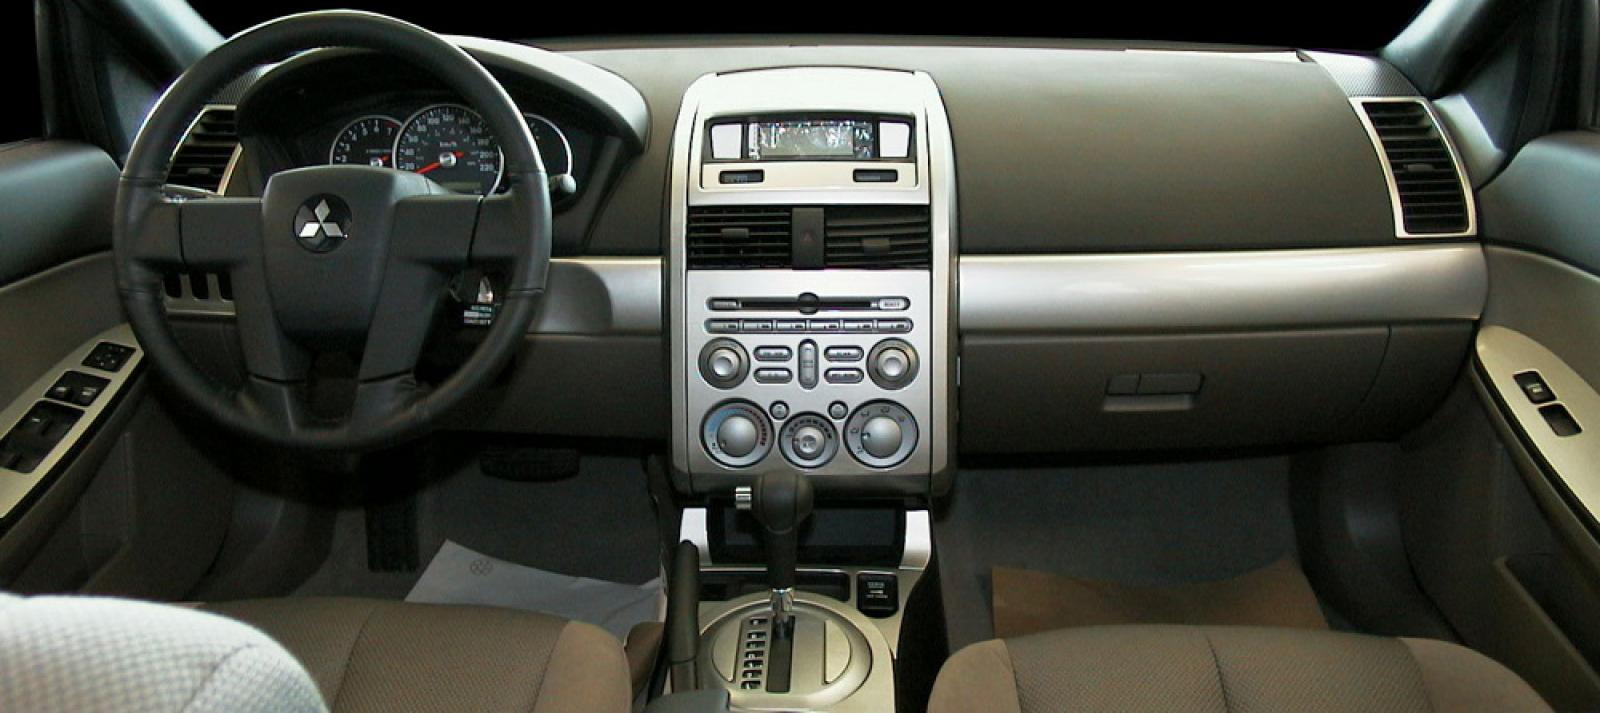 2004 Mitsubishi Galant Information And Photos Zombiedrive